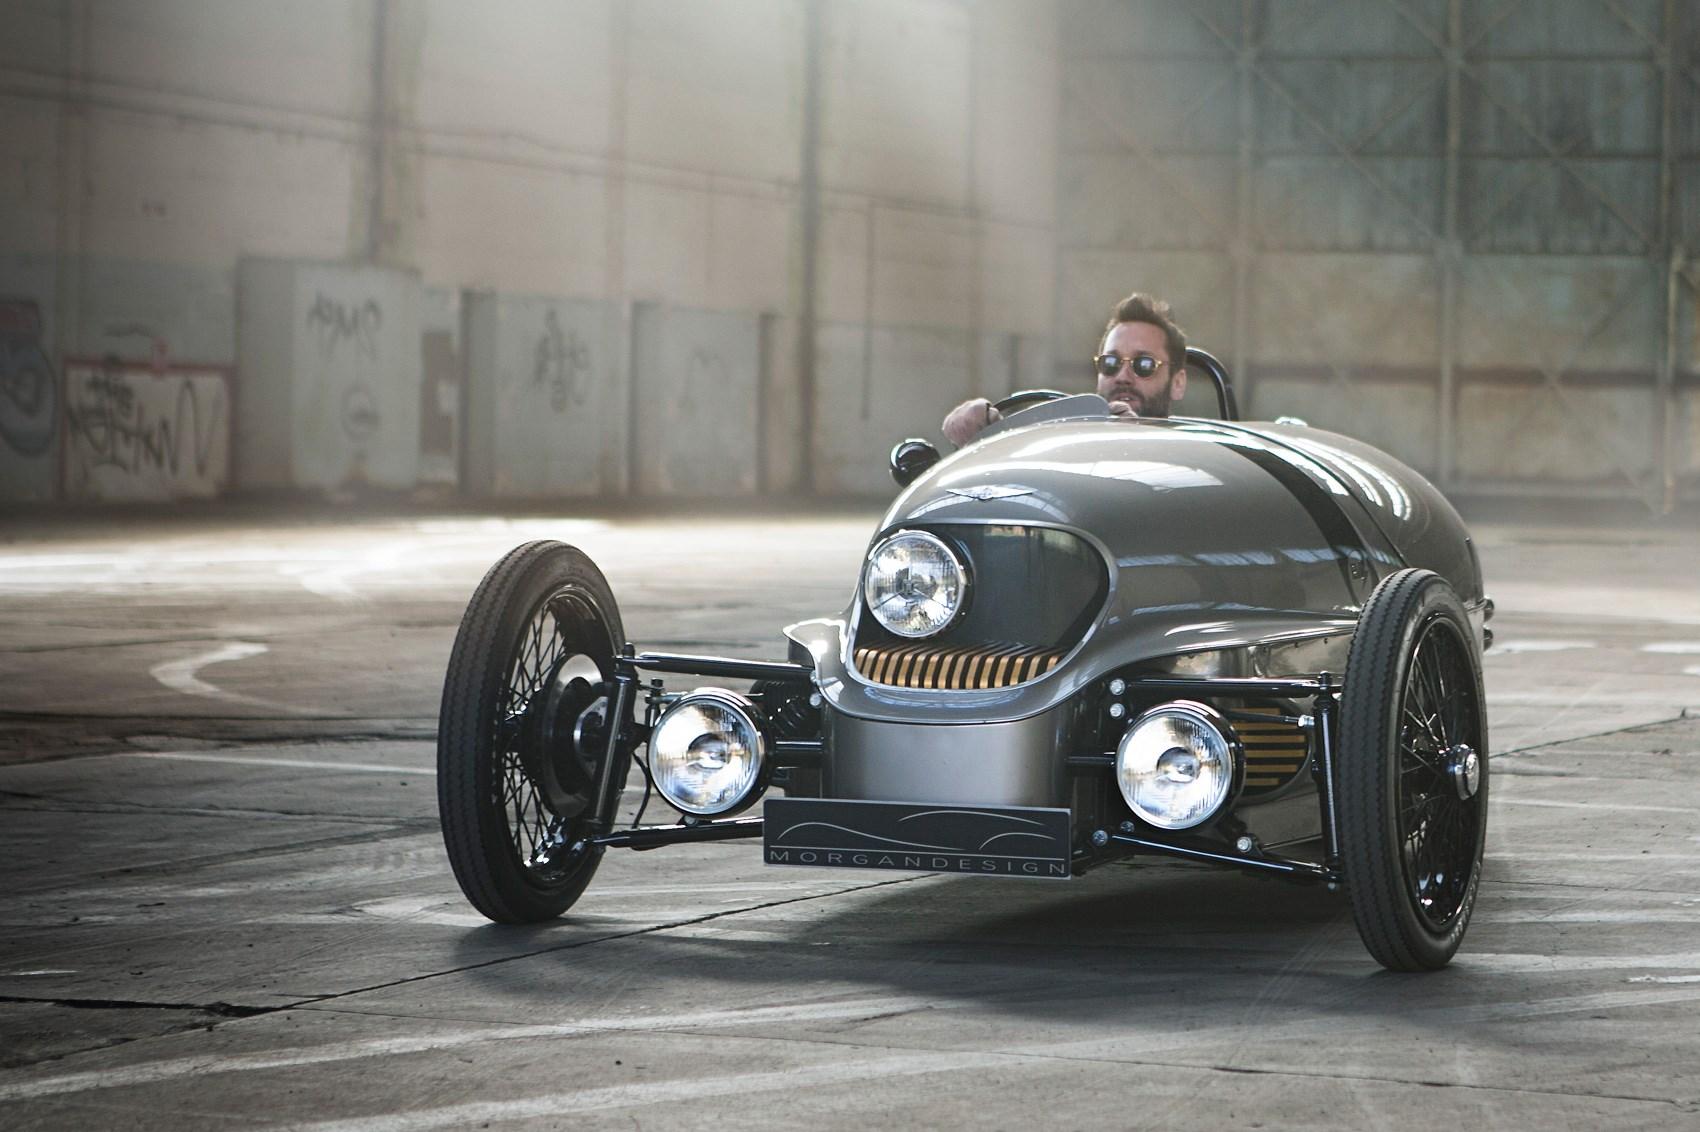 Hot Rod Car Shows Uk